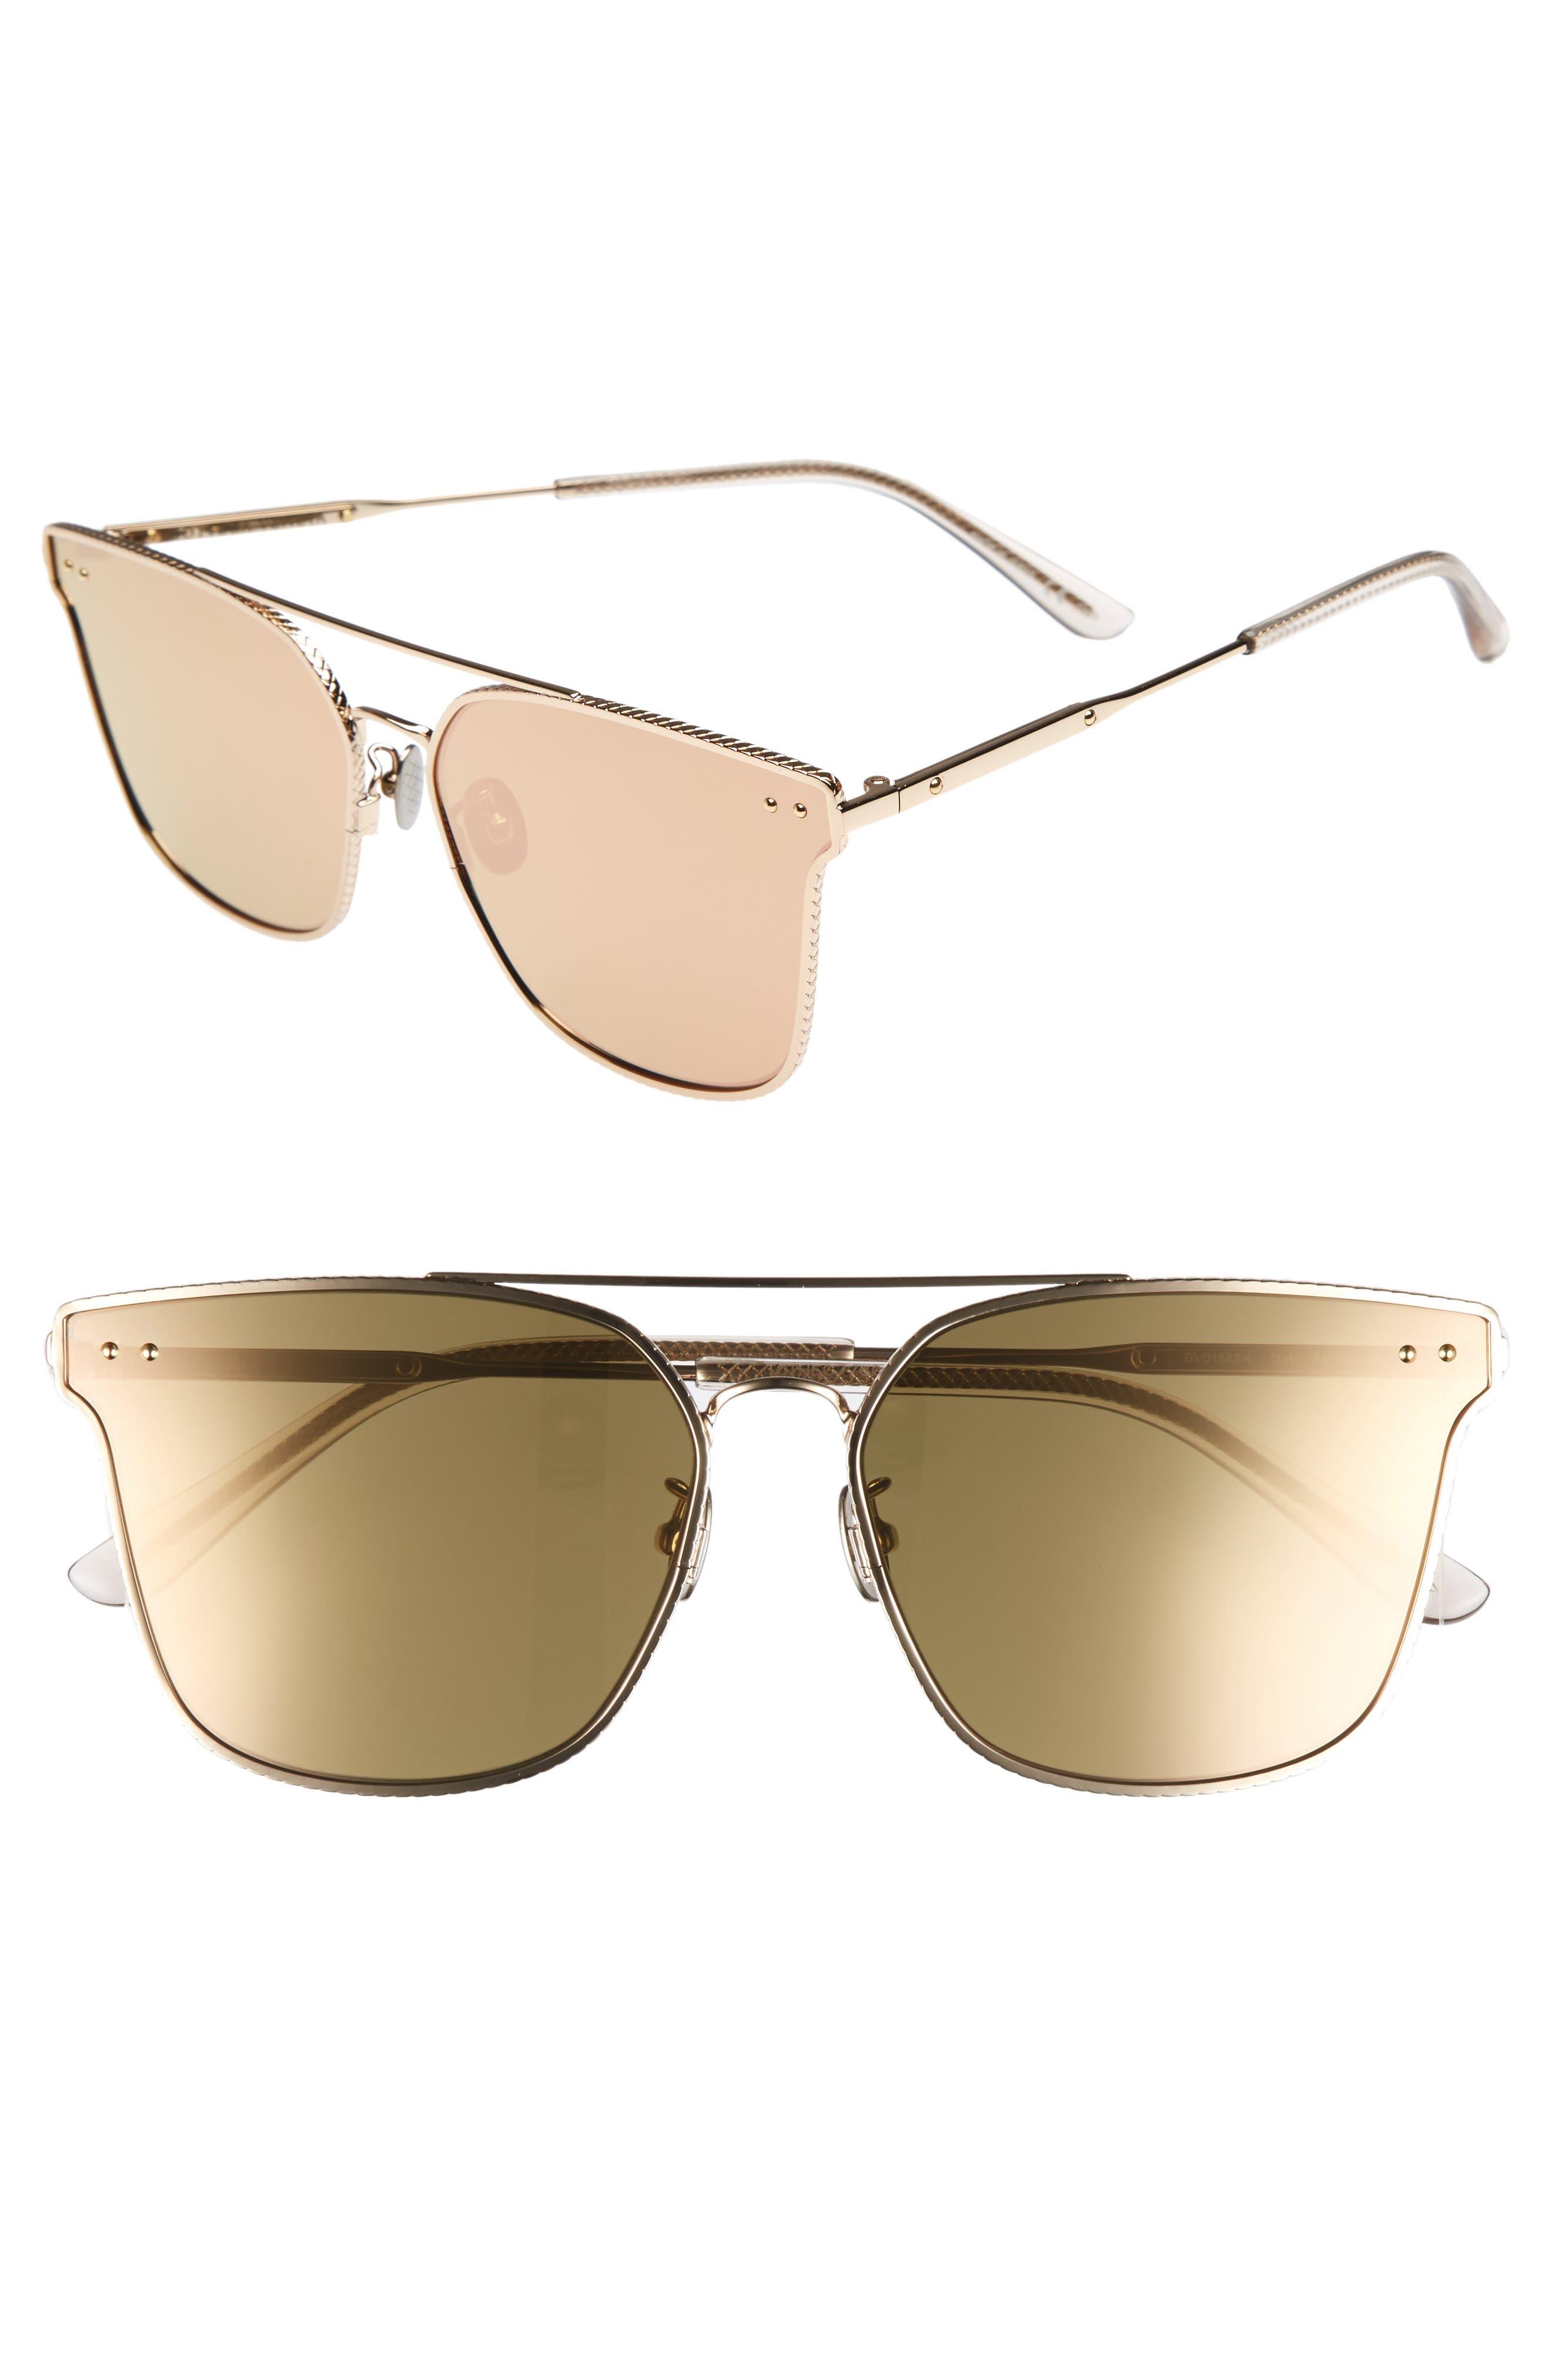 64mm Sunglasses,                             Main thumbnail 1, color,                             Gold